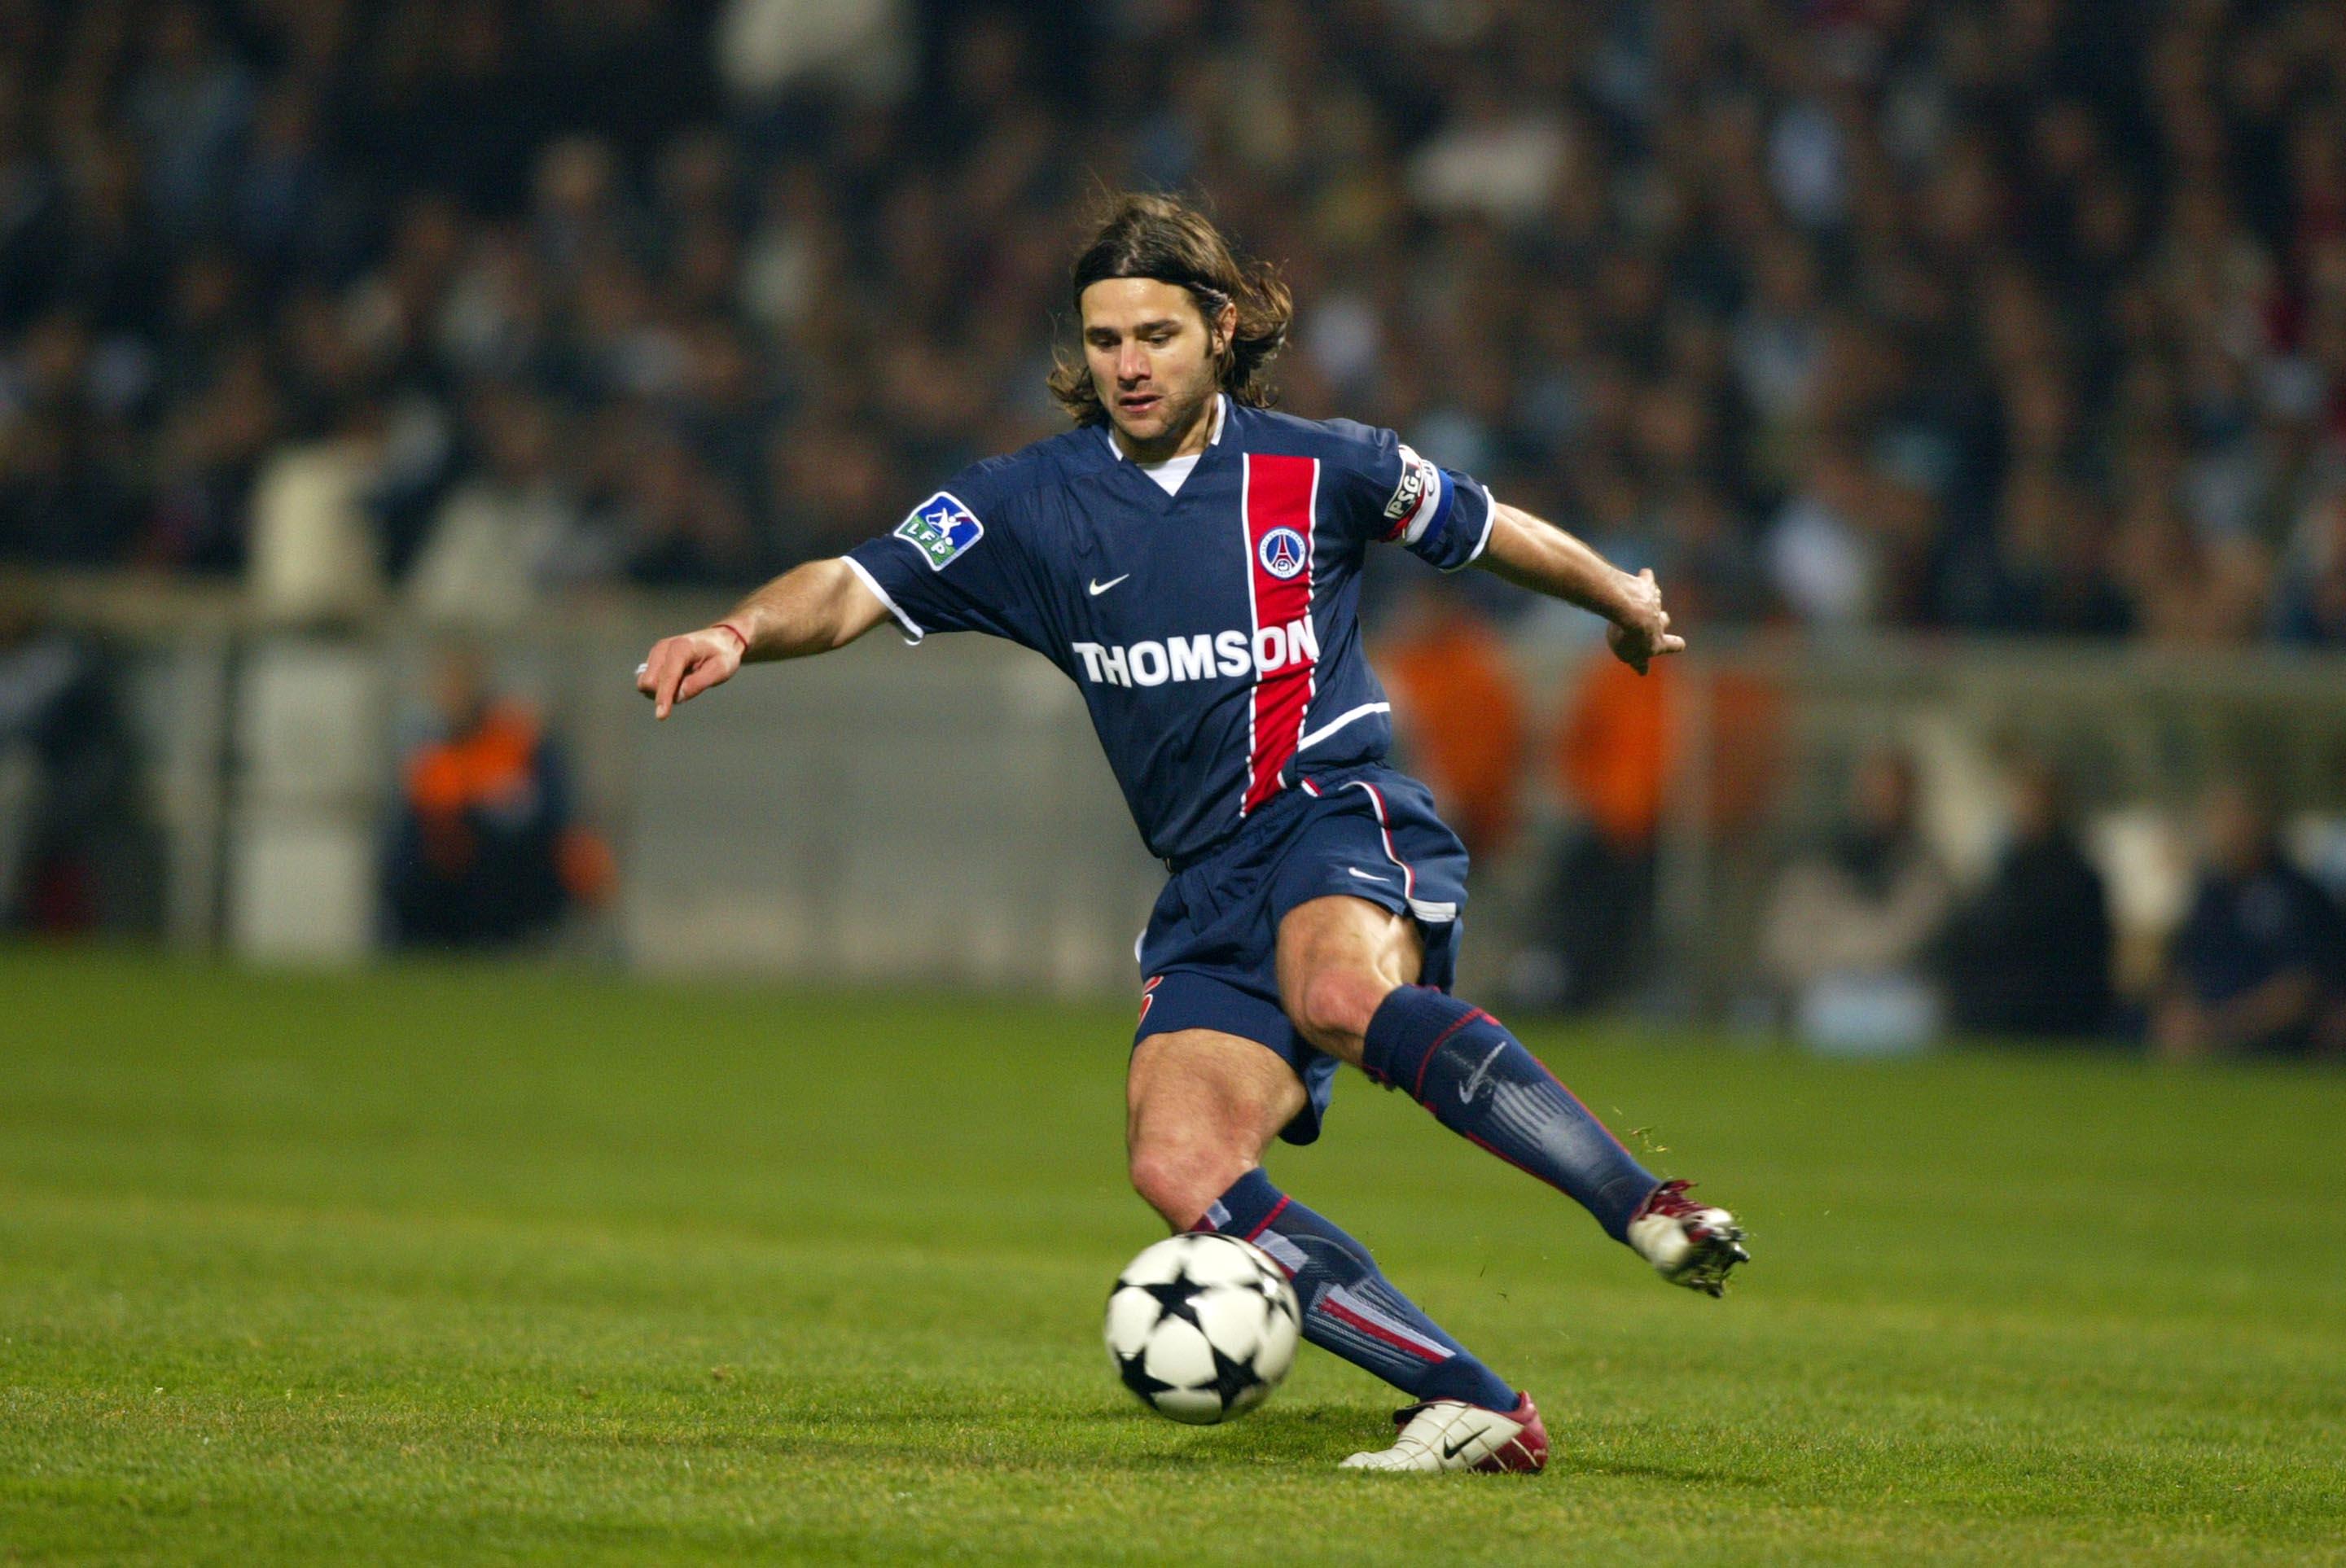 Mauricio POCHETTINO - 09.03.2003 - Marseille / PSG - 30eme journee de Ligue 1 - Stade Velodrome - Marseille -